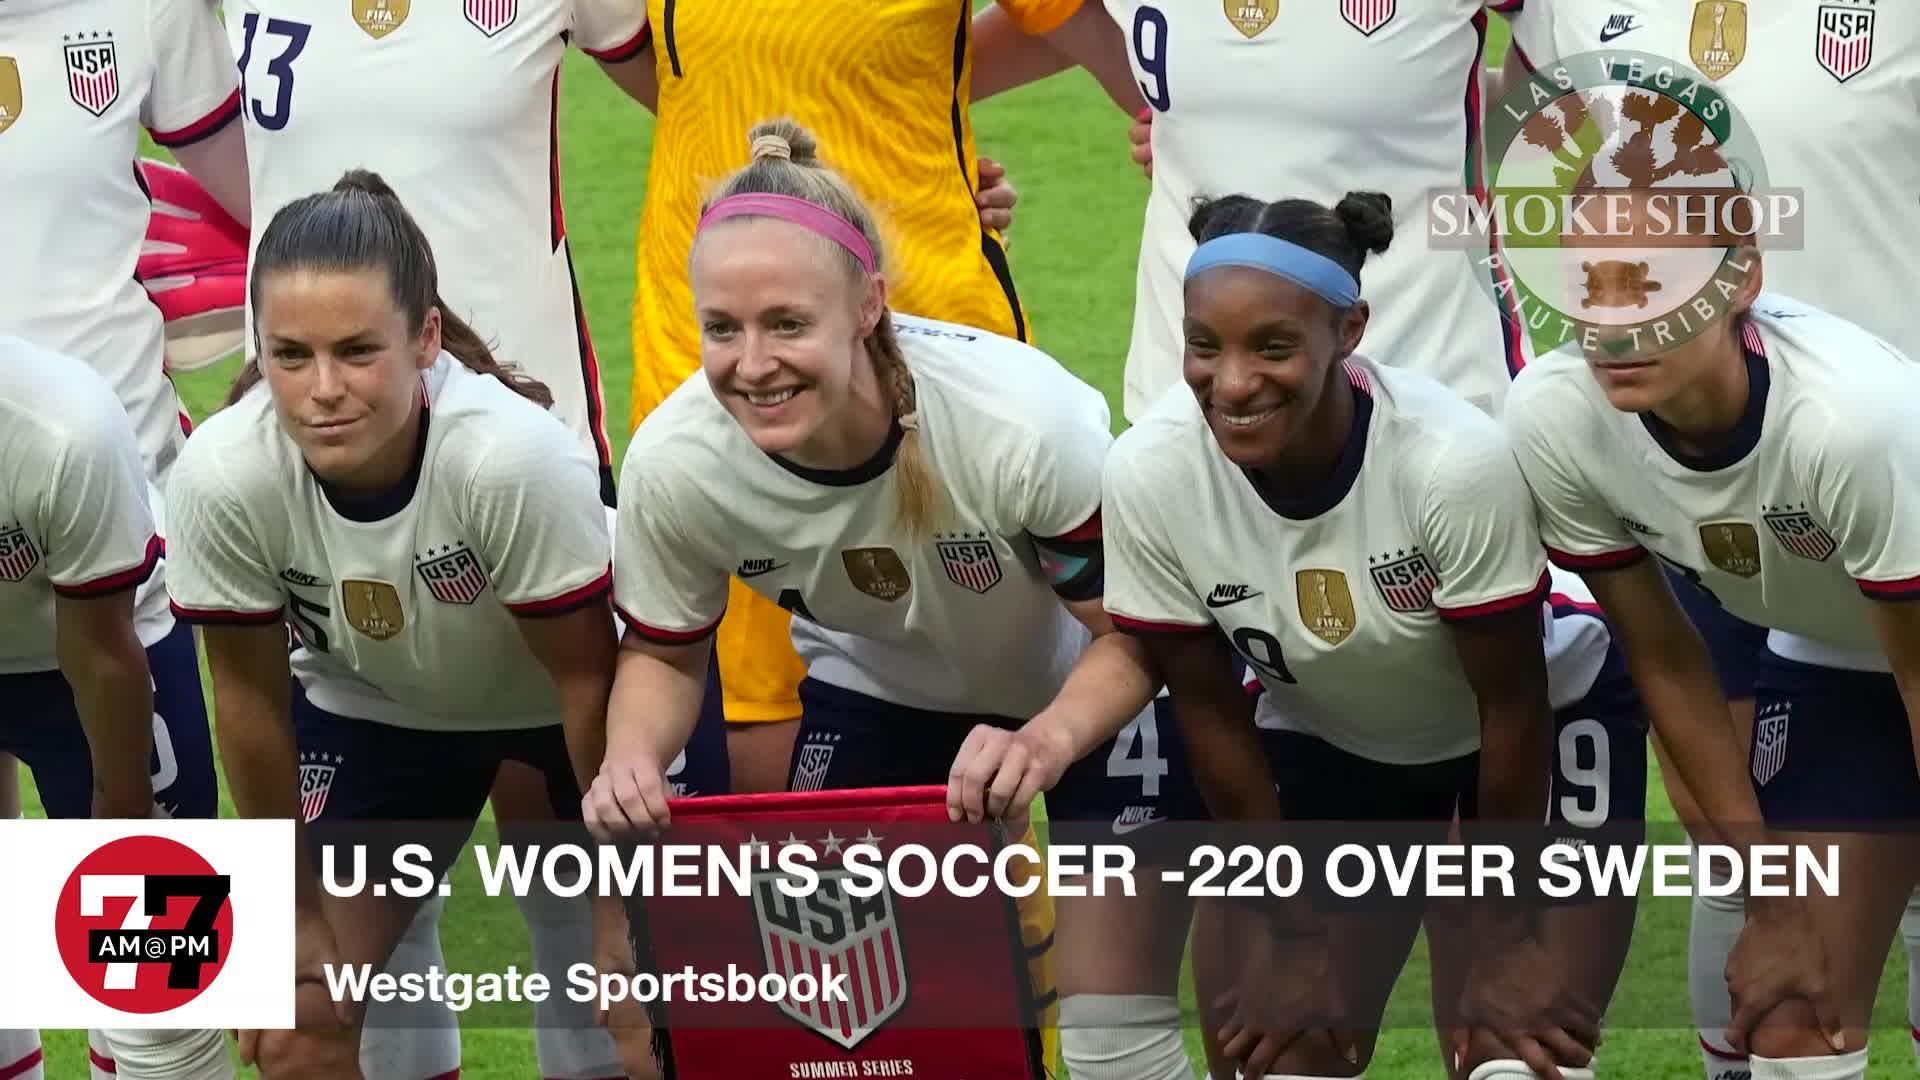 7@7PM U.S. Women's Soccer -220 Over Sweden